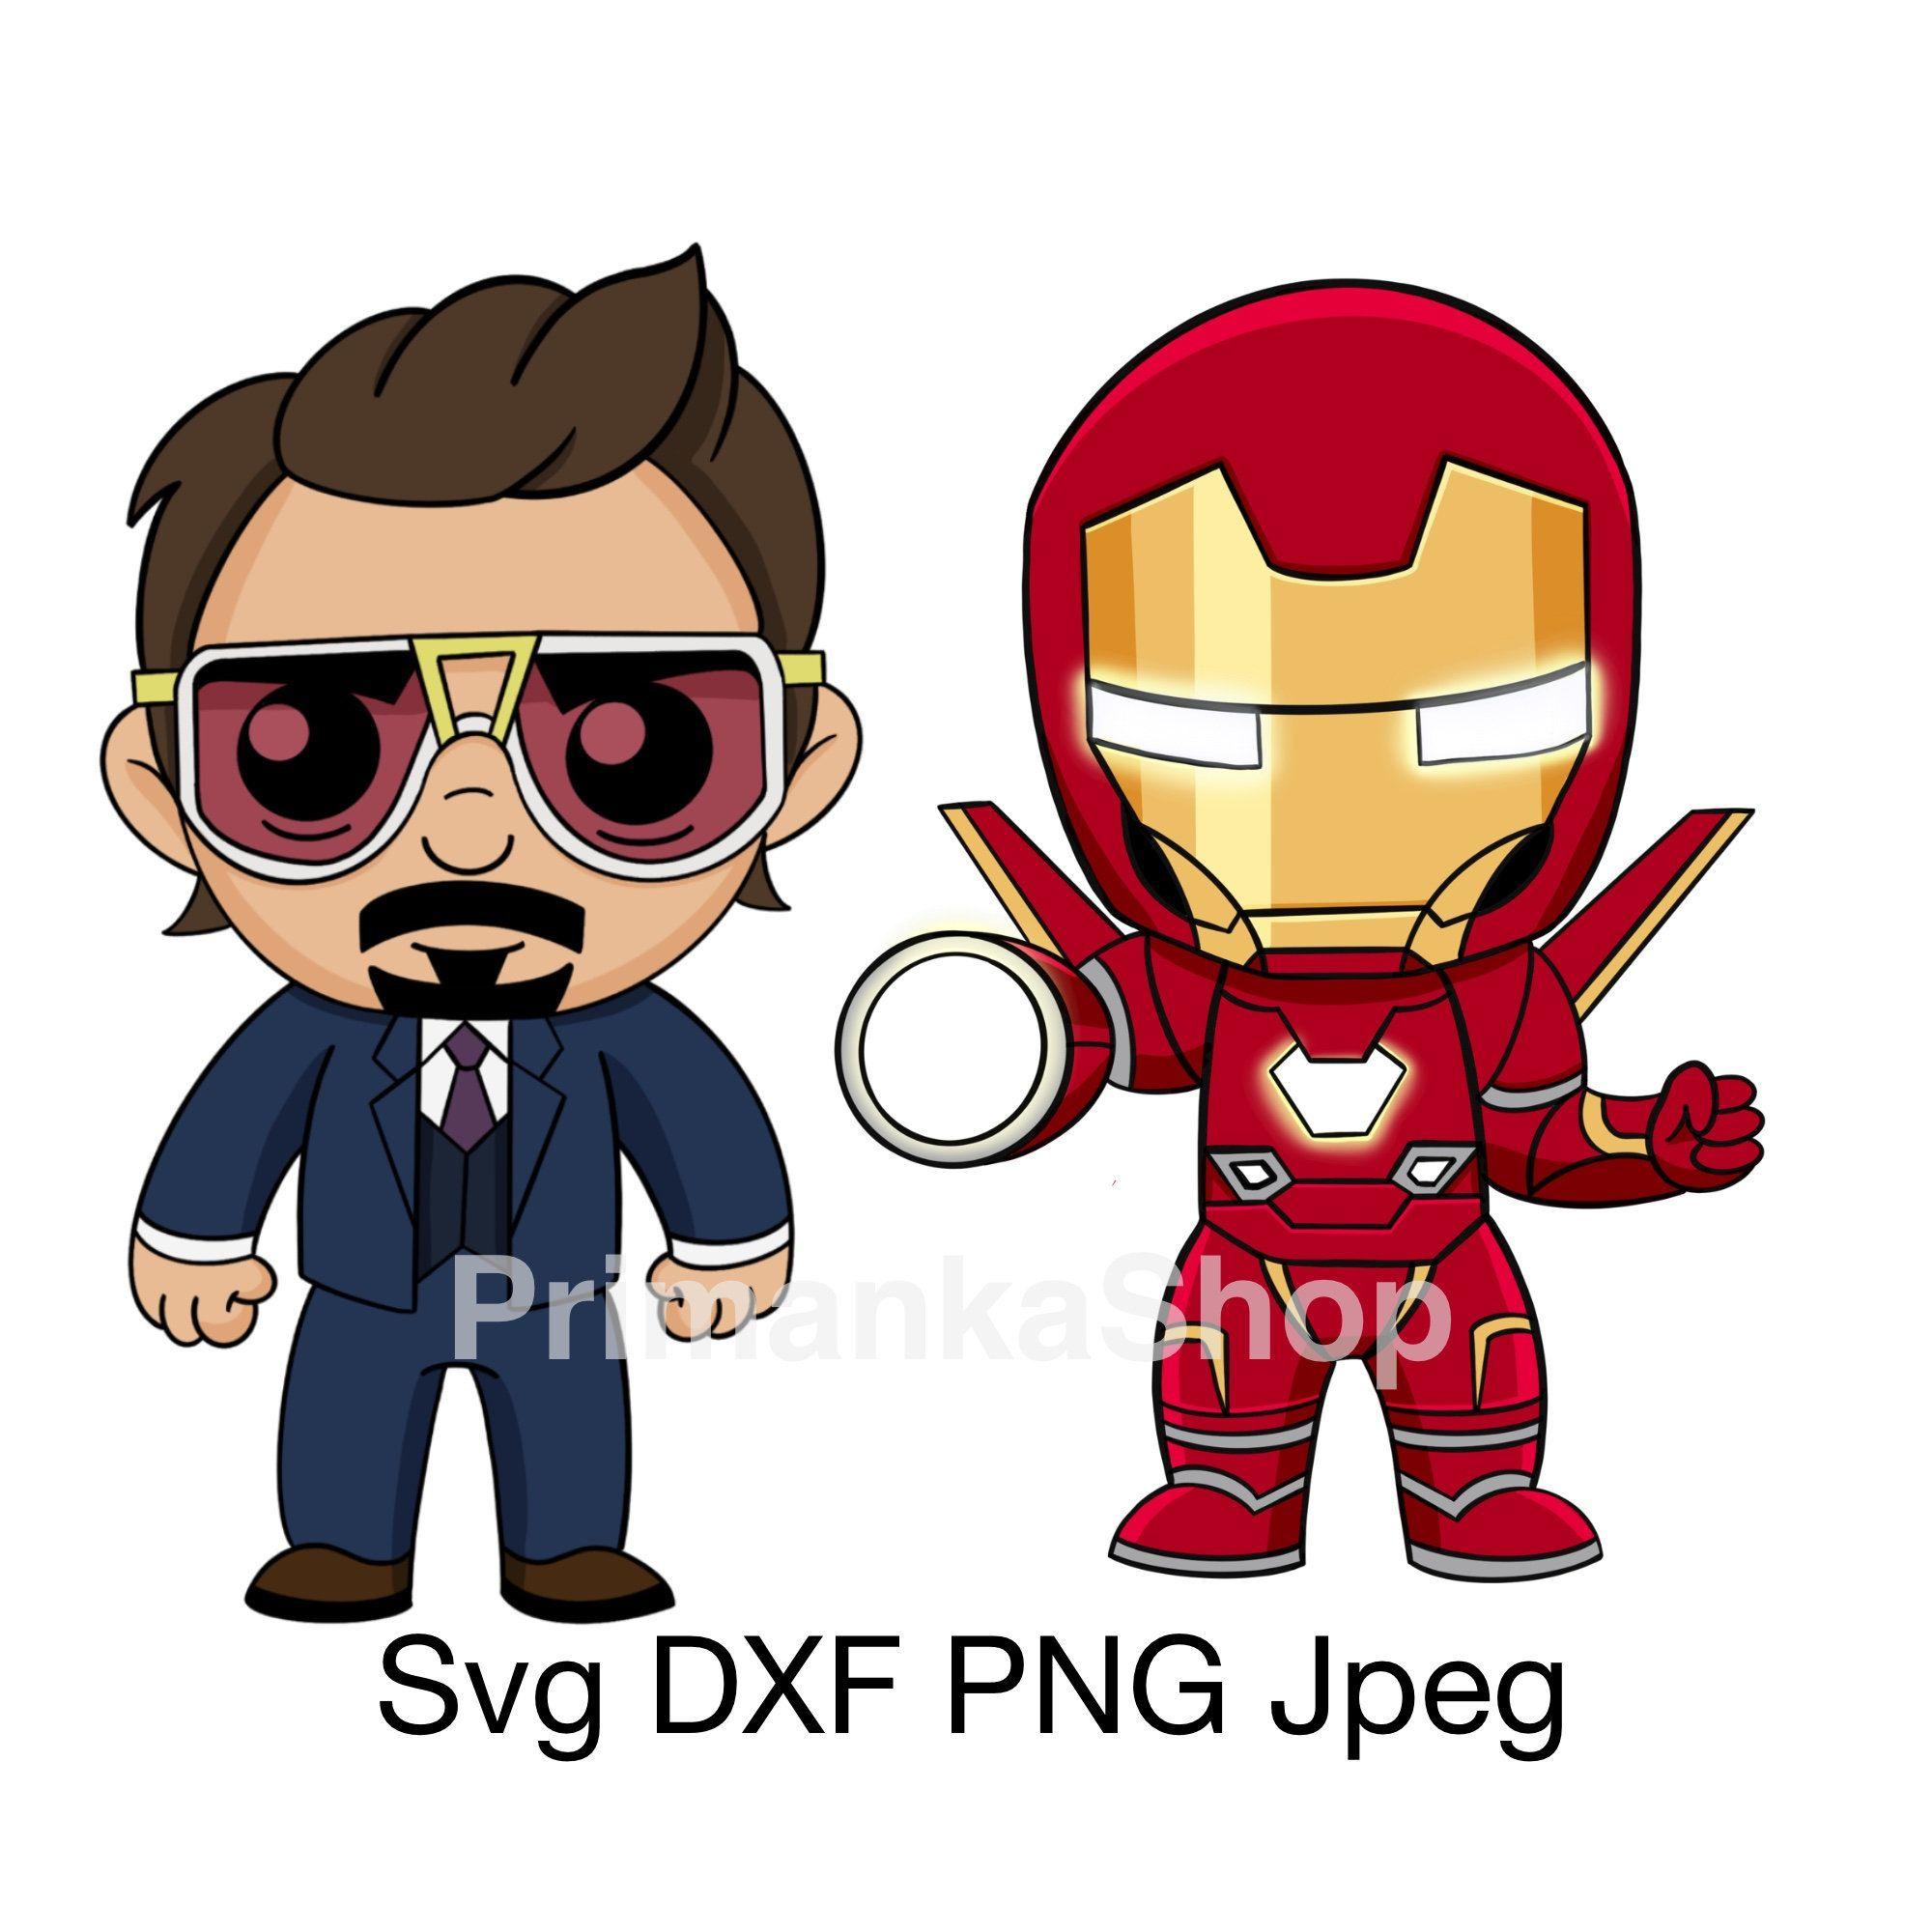 Marvel Svg Iron Man Svg Tony Stark Svg Layered Svg Avengers Endgame Marvel Comics Character Baby Superheroes Png Iron Man Cartoon Iron Man Drawing Iron Man